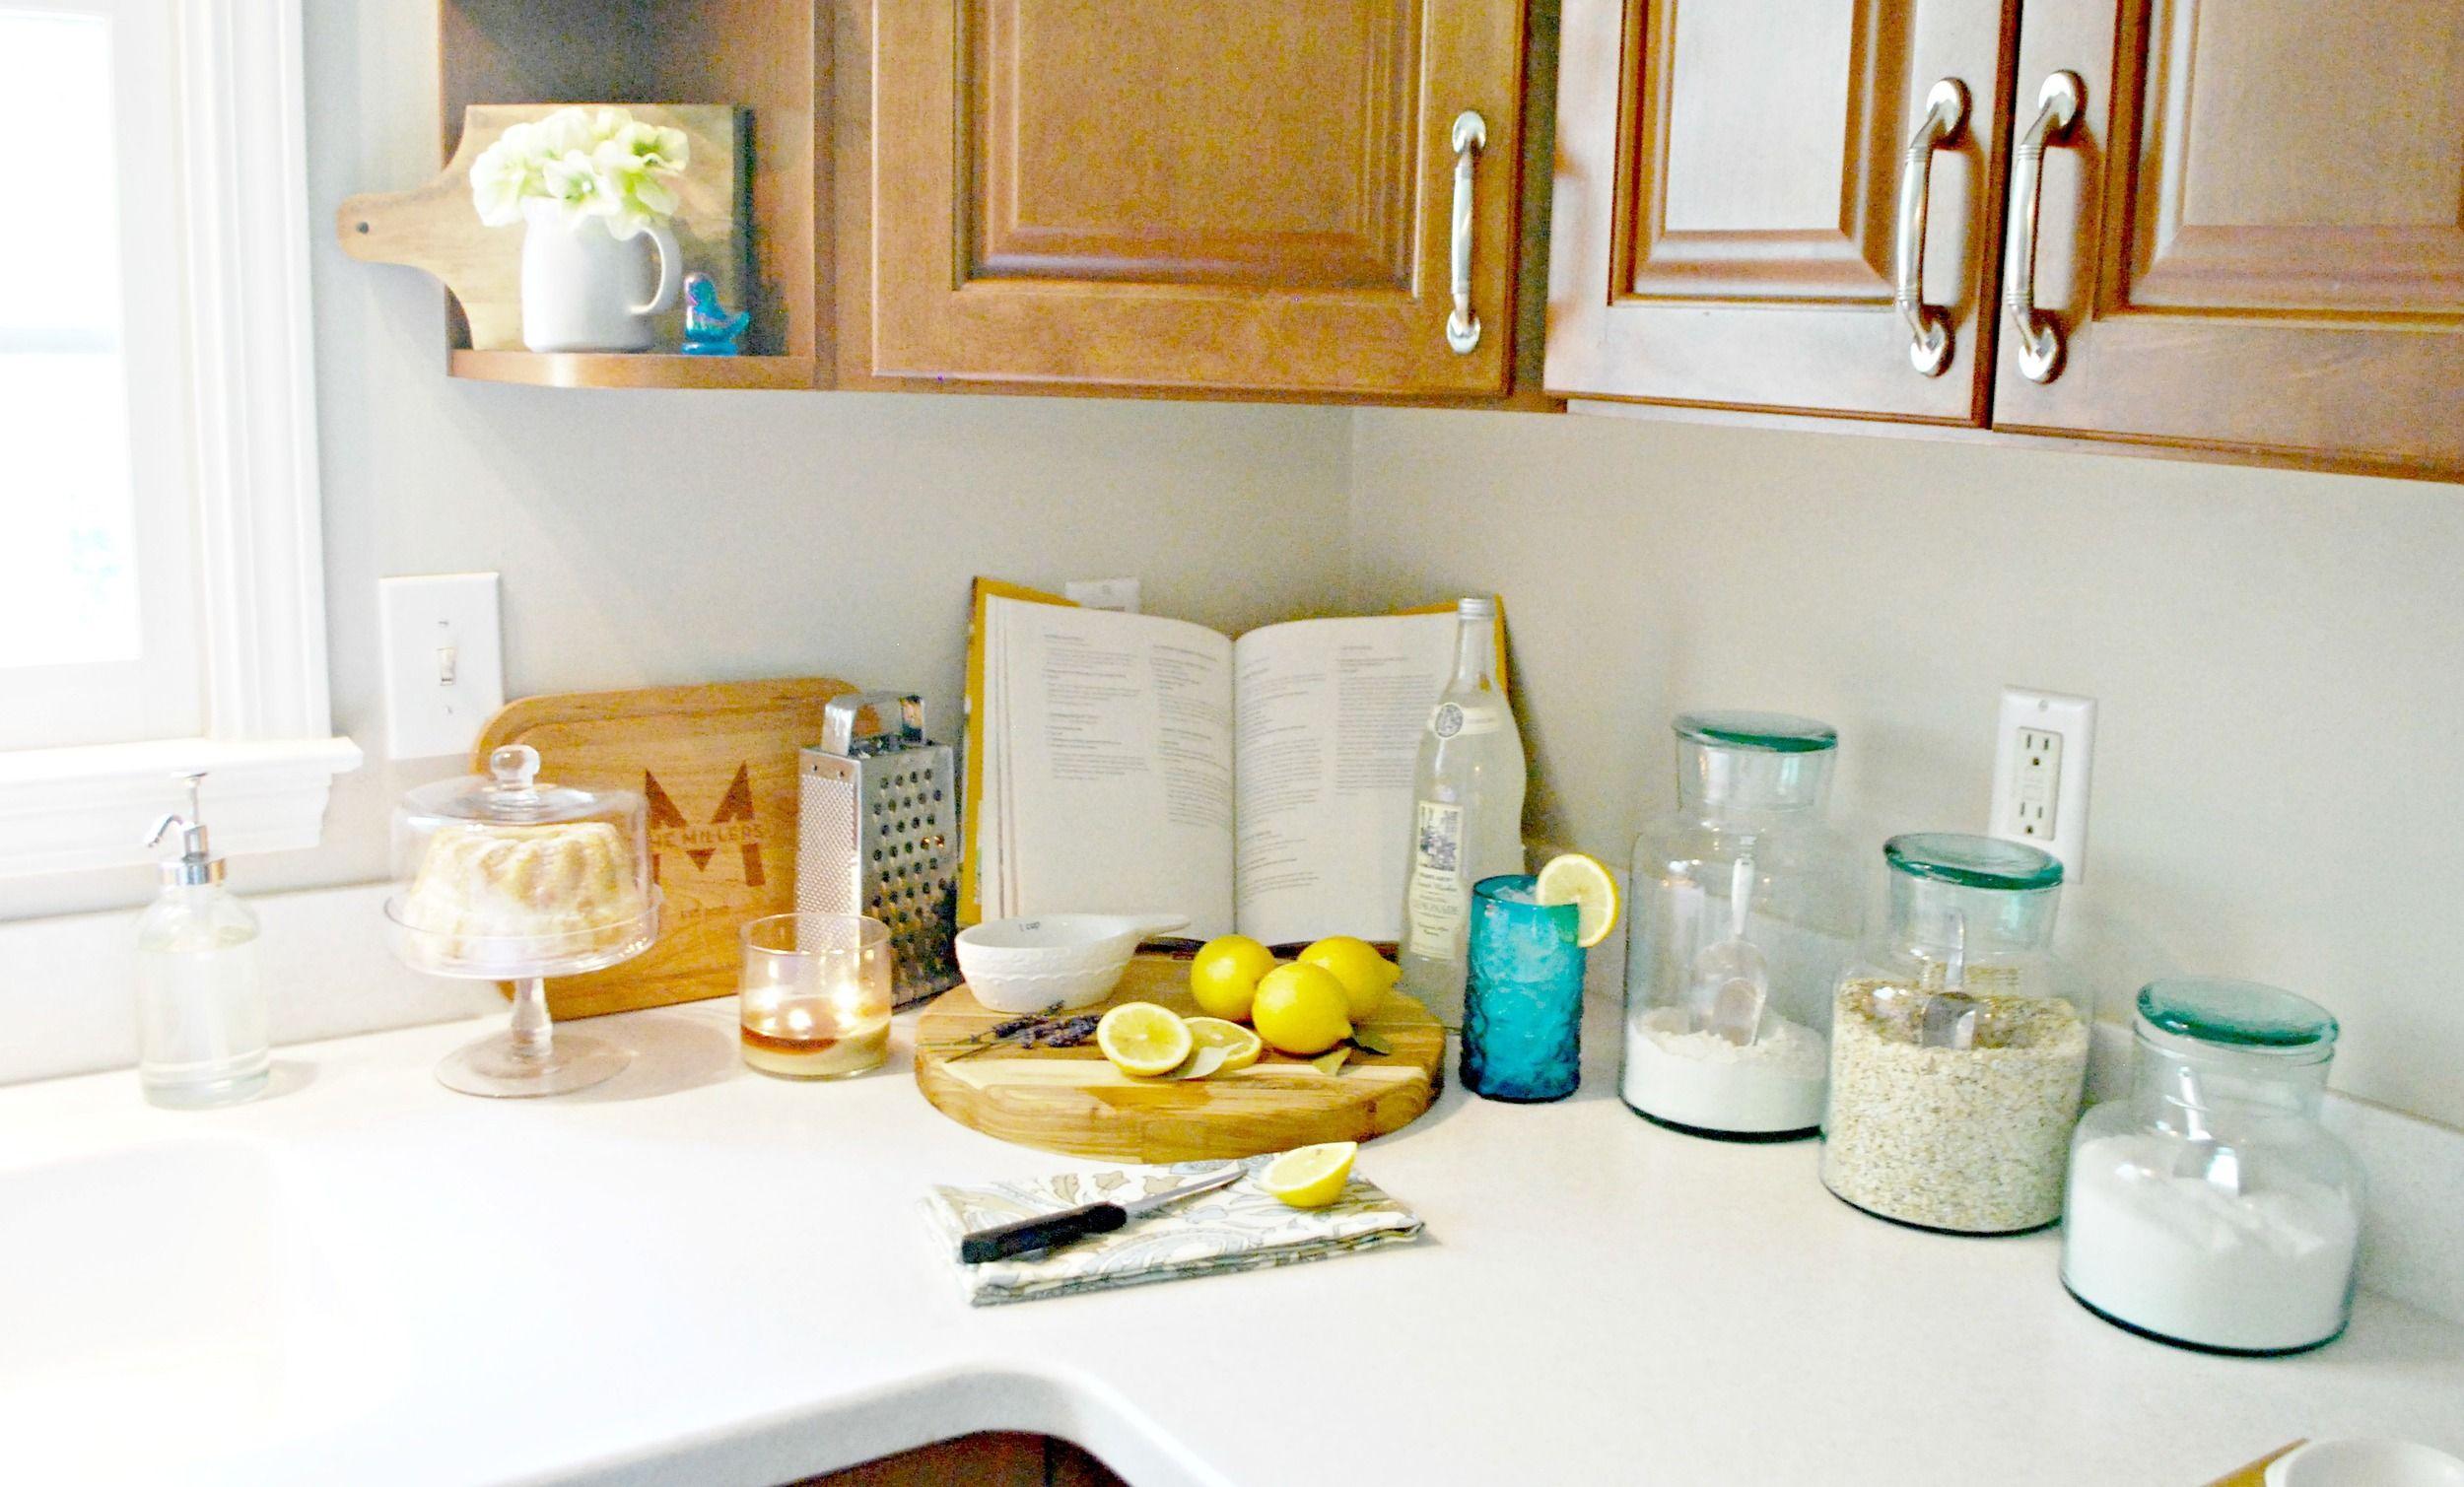 Plum pretty decor and design kitchensimple kitchen design